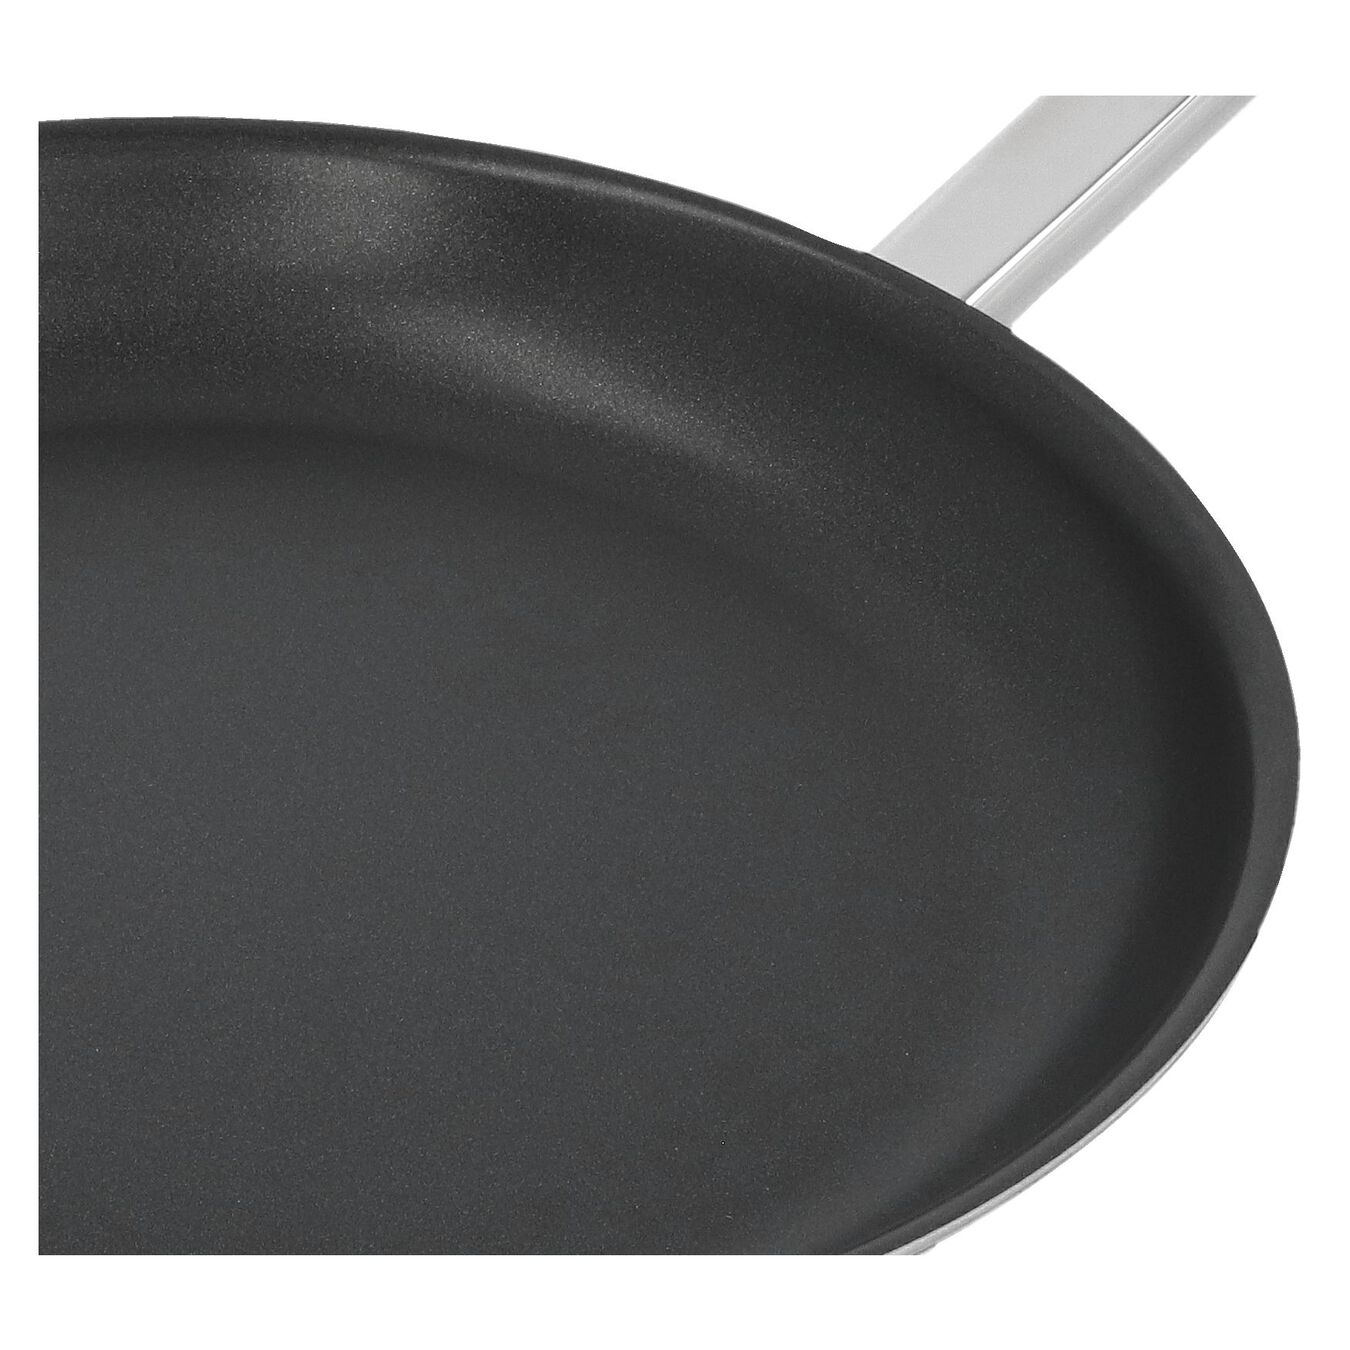 Pannenkoekenpan Duraslide 28 cm,,large 3